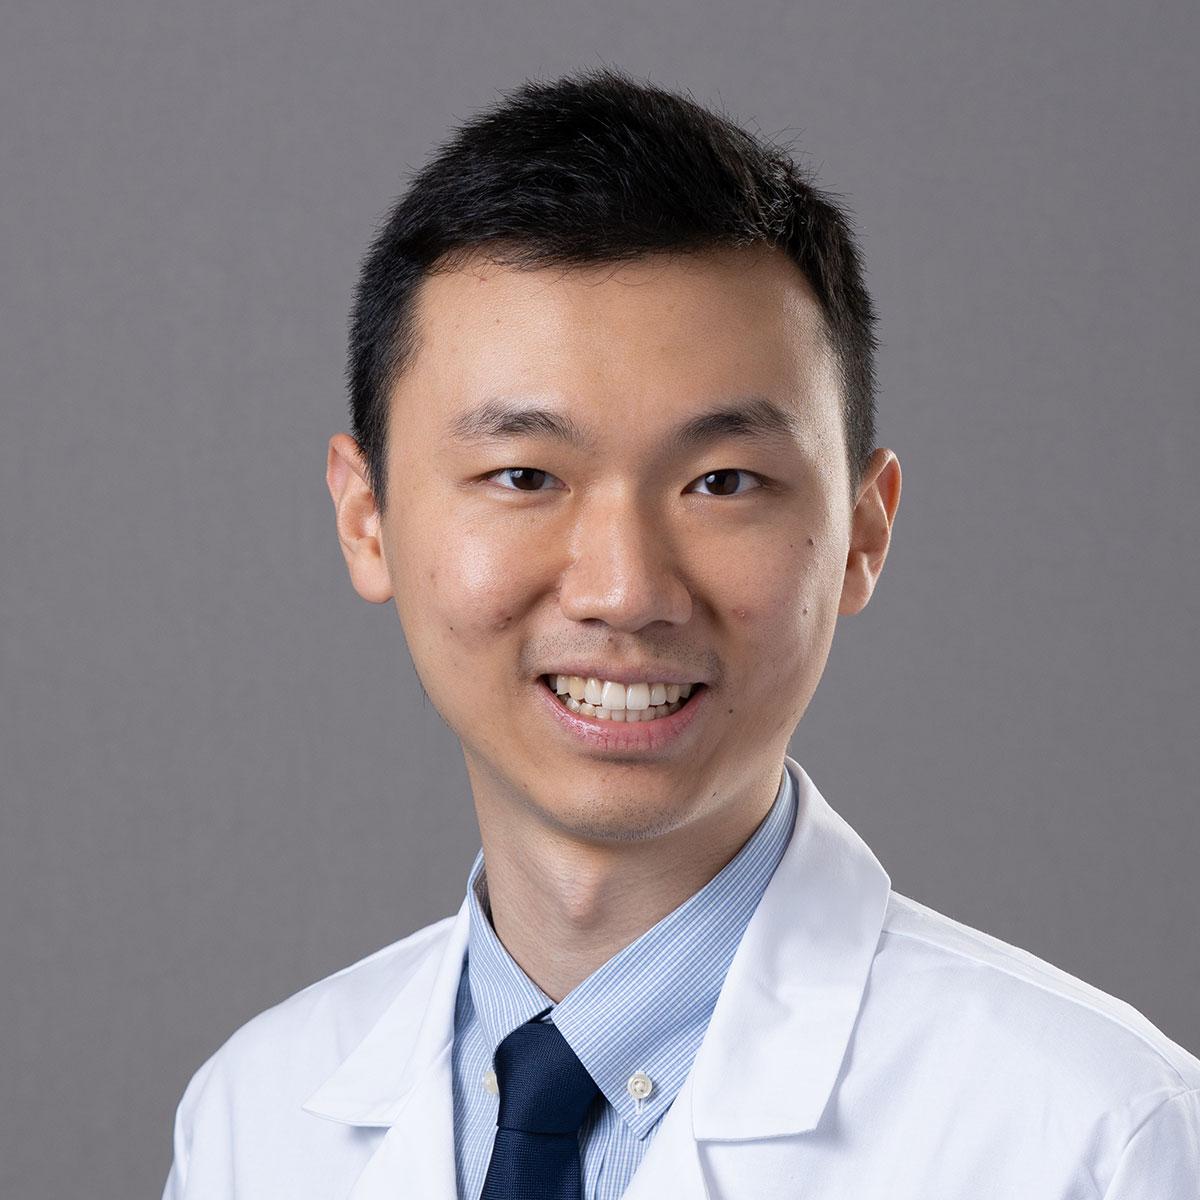 A friendly headshot of Dr. Frank Chen